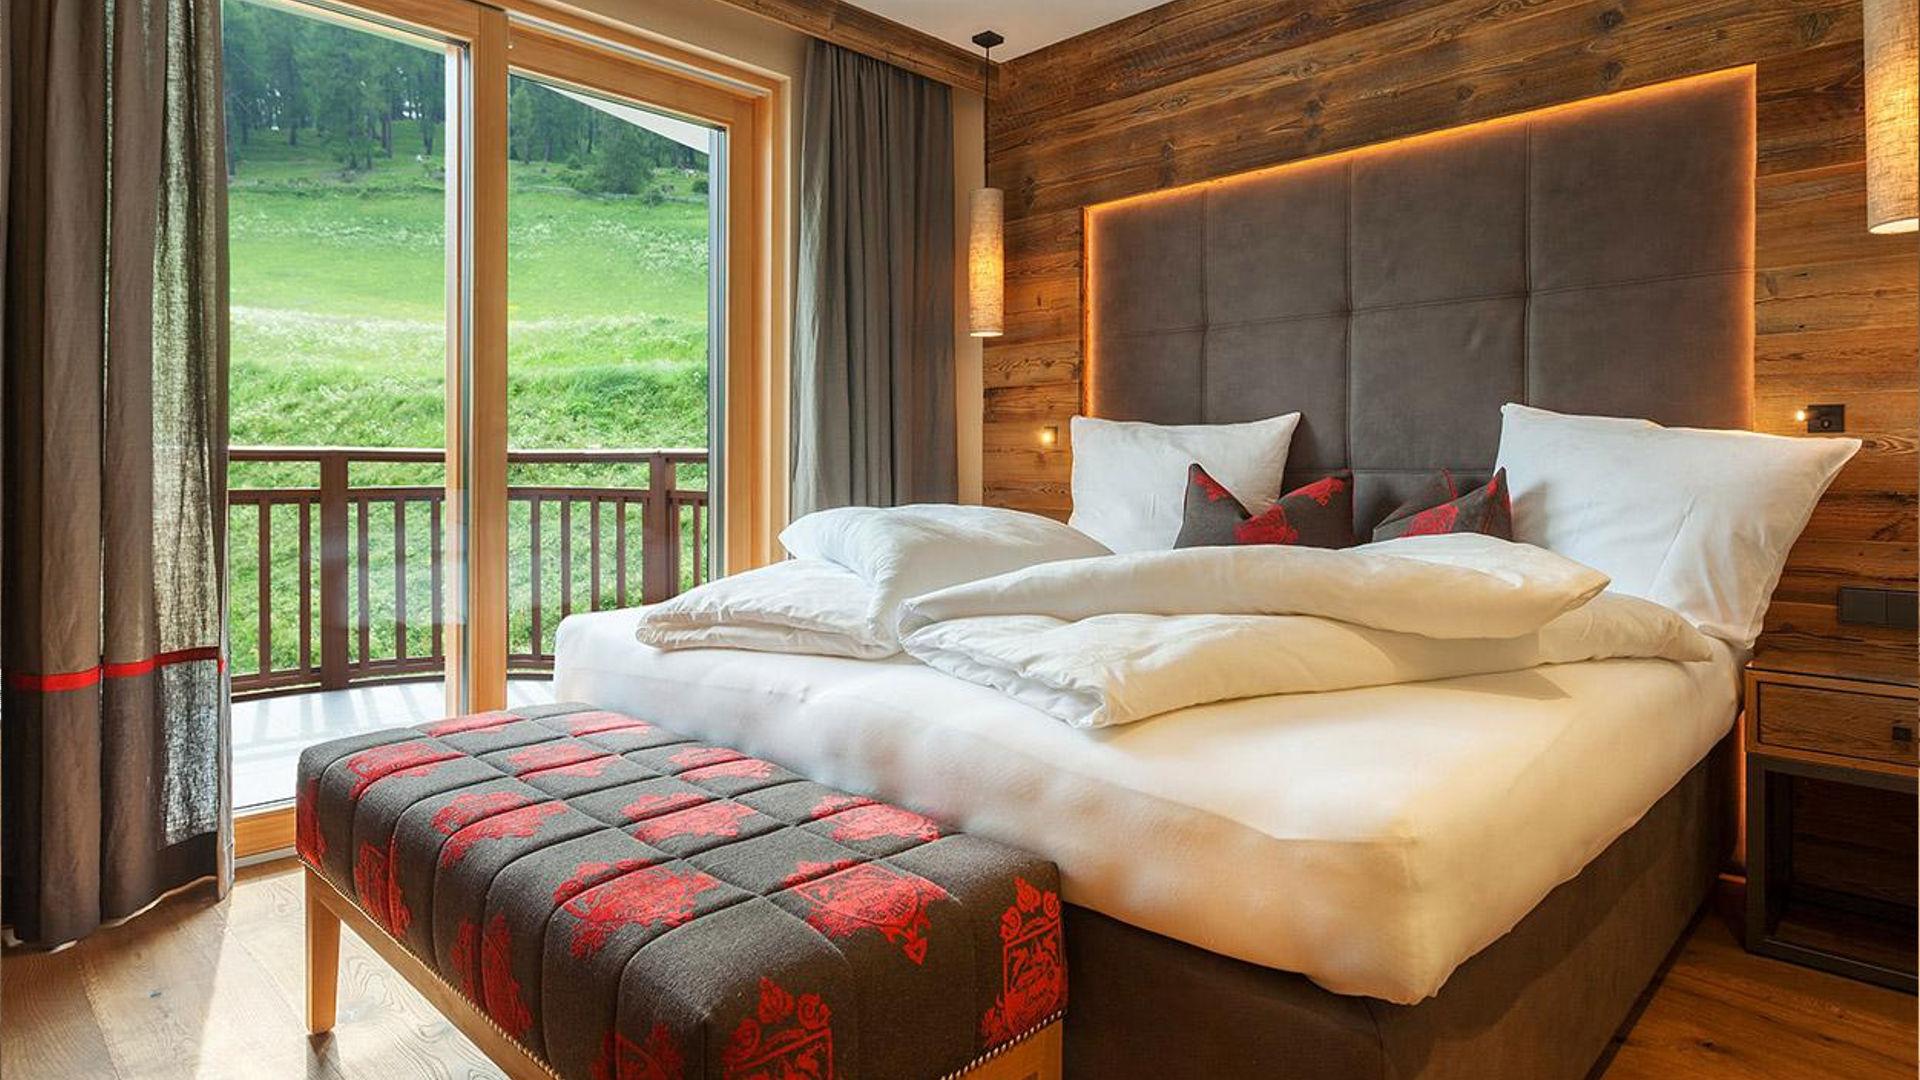 Camera Hotel Watles Val Venosta Benessere